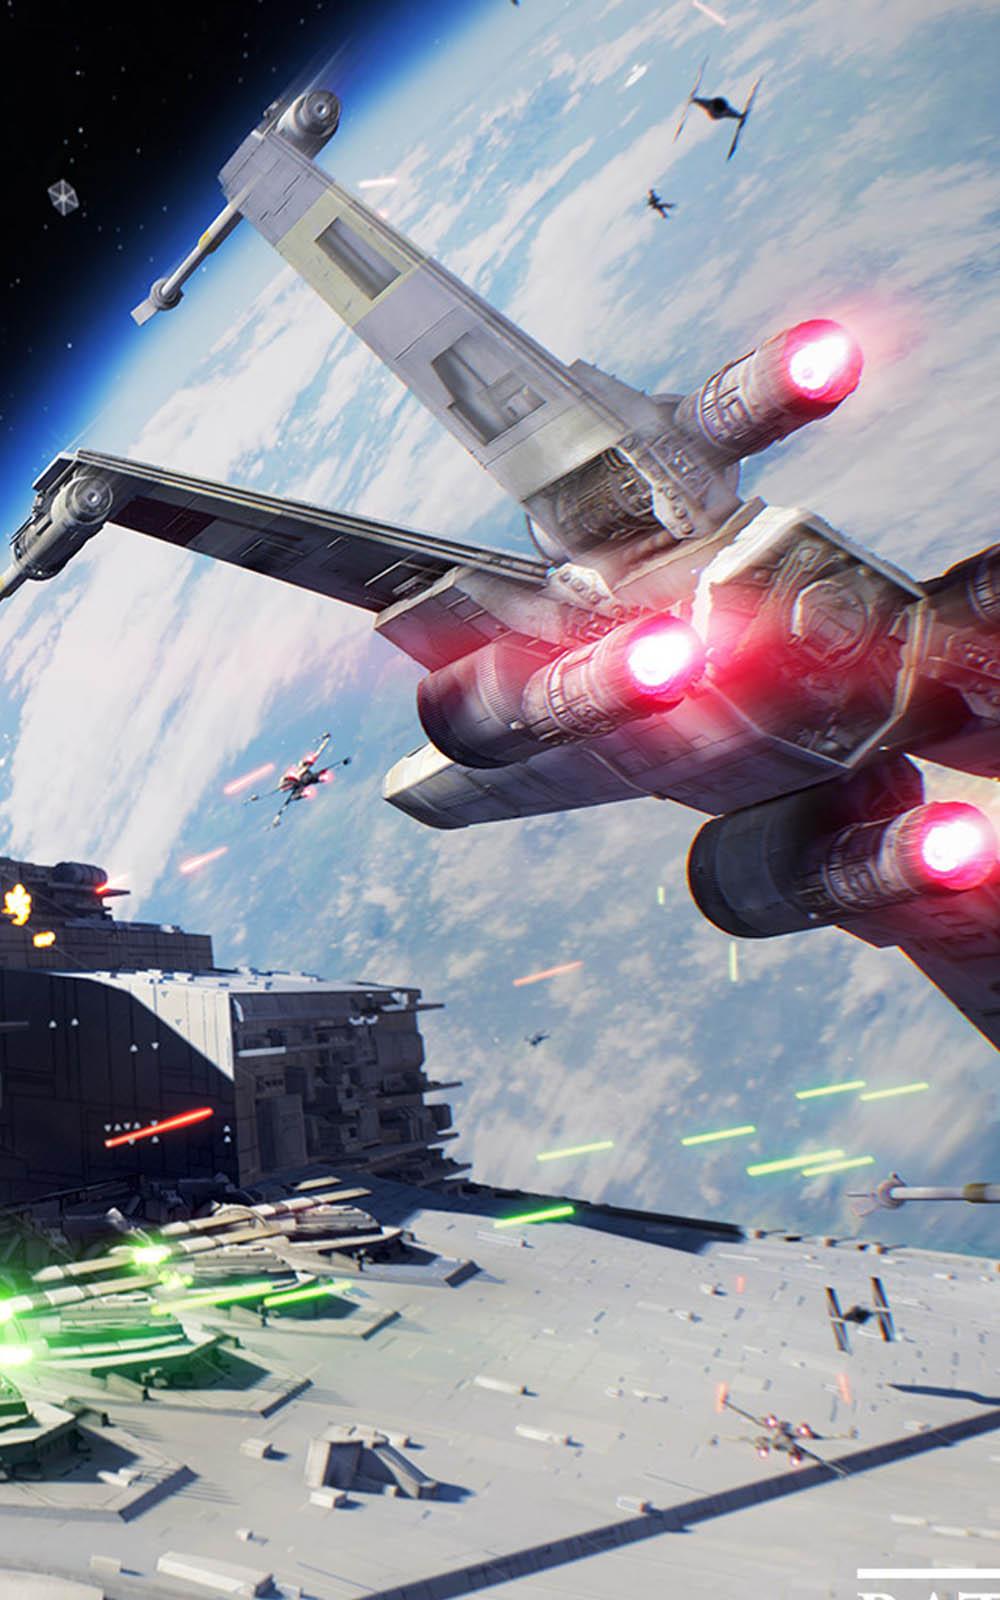 Spaceship Star Wars - Battlefront II 4K Ultra HD Mobile ...